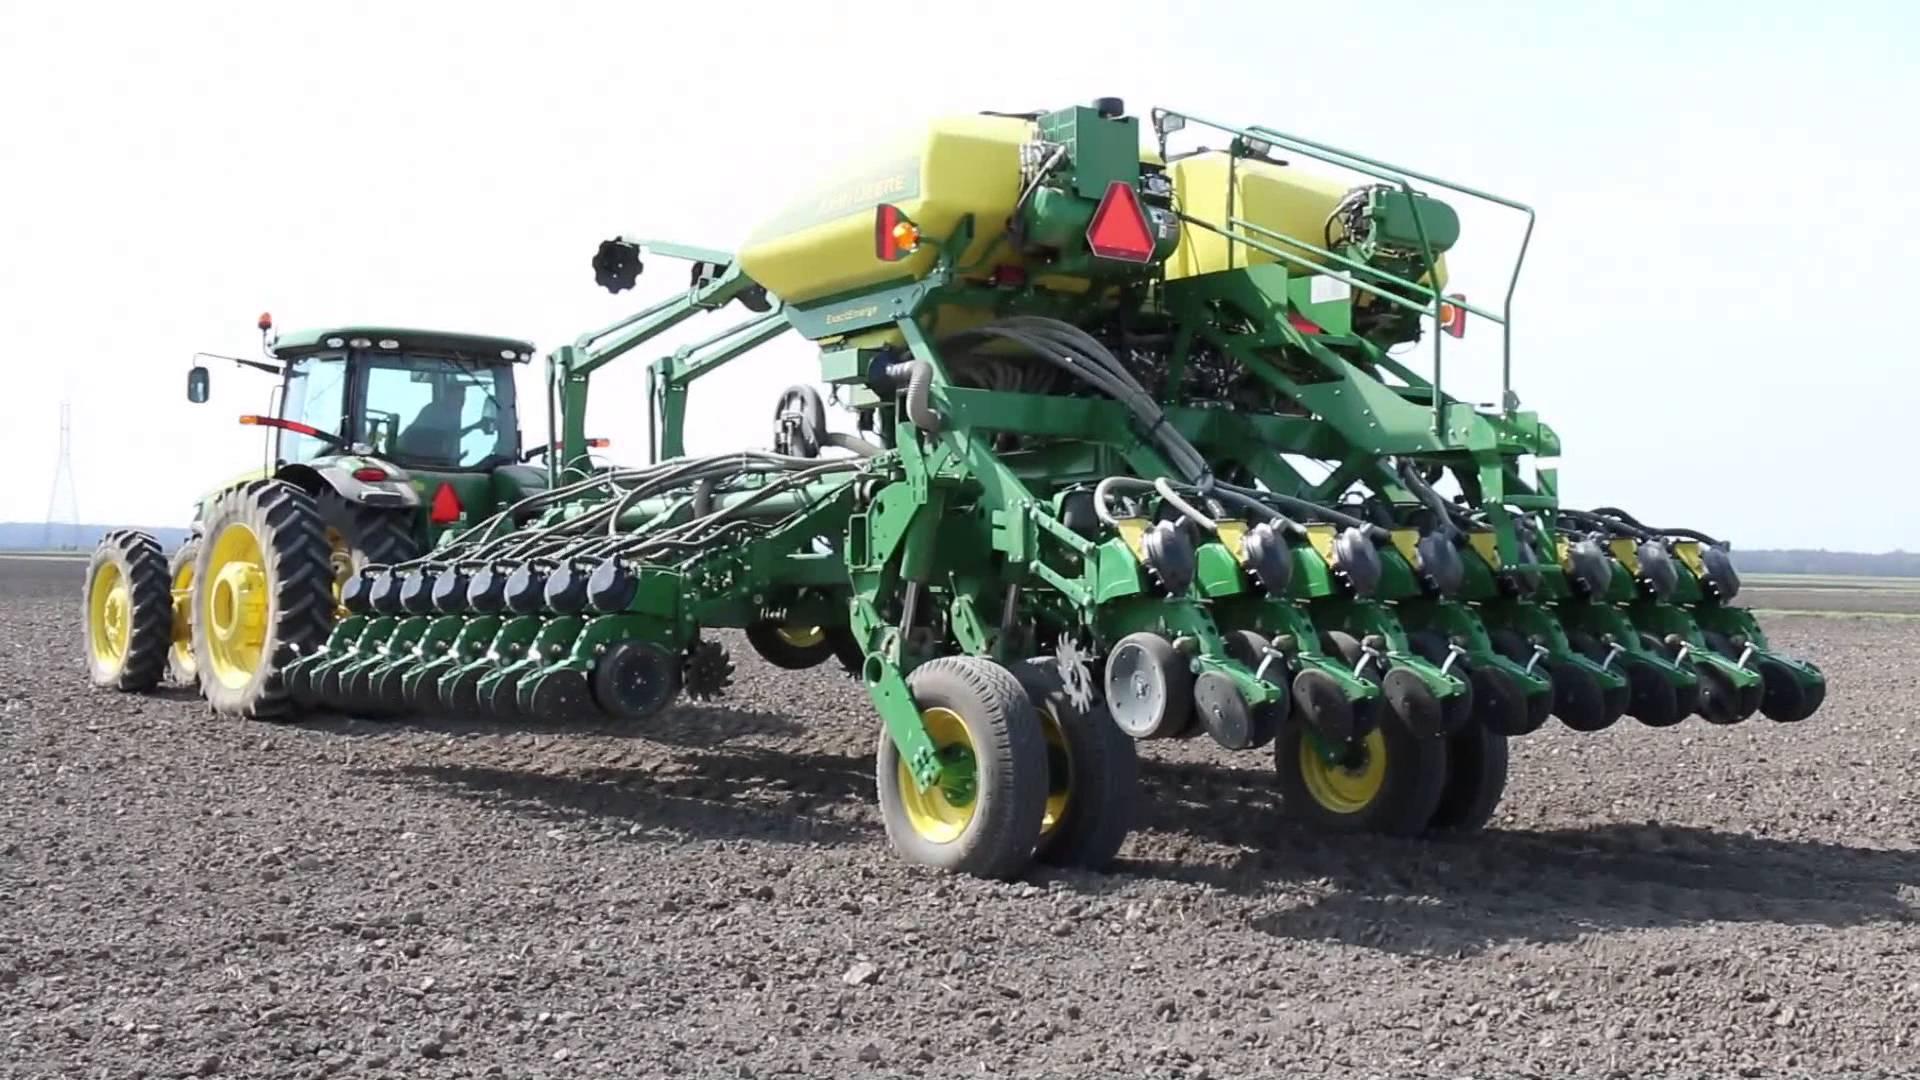 John Deere 24-row ExactEmerge planter, Purdue Agronomy | FunnyCat.TV